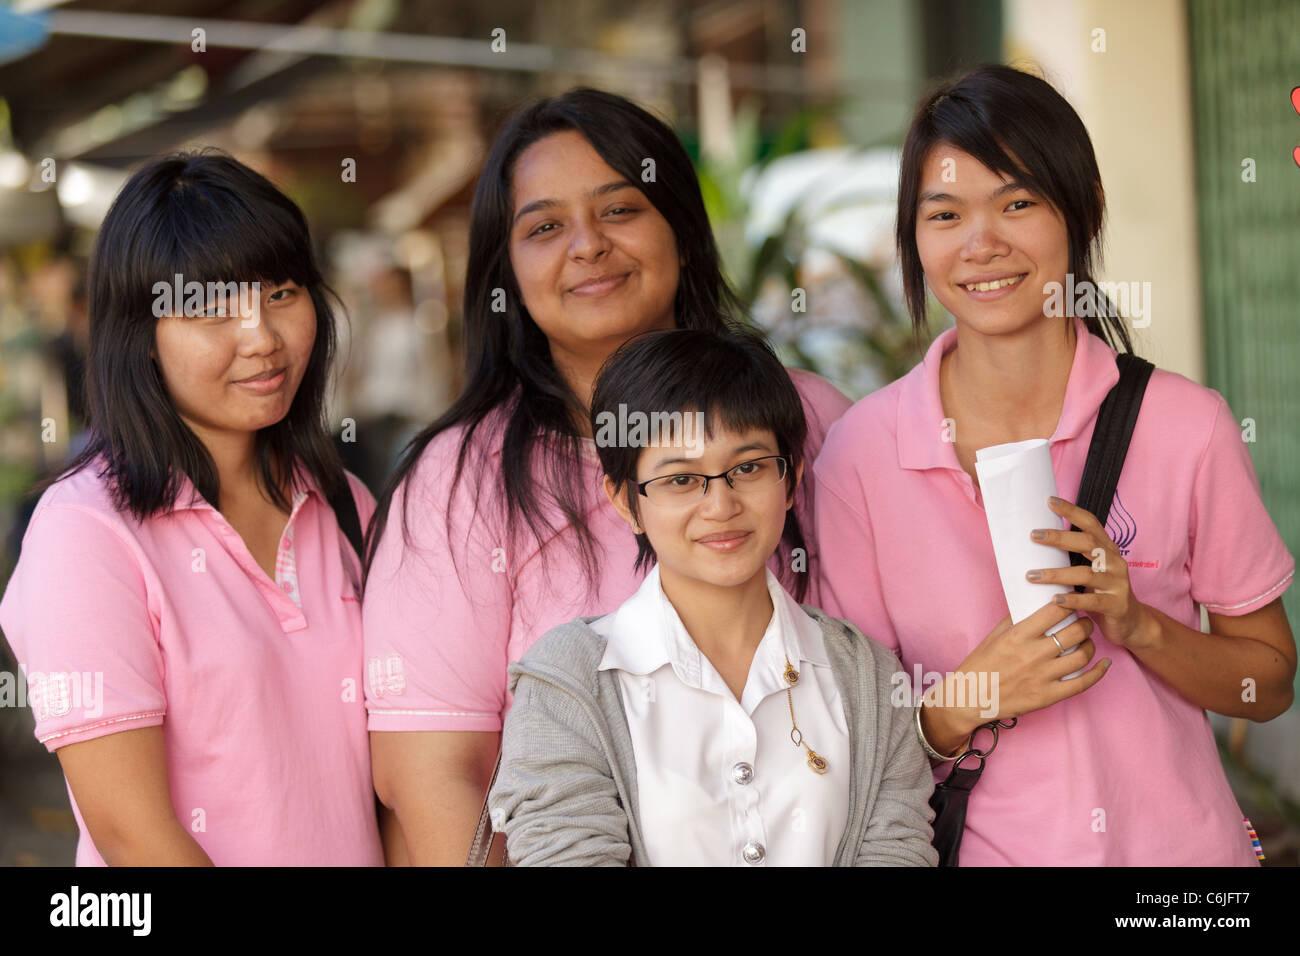 Thai Girls Stock Photos & Thai Girls Stock Images - Alamy